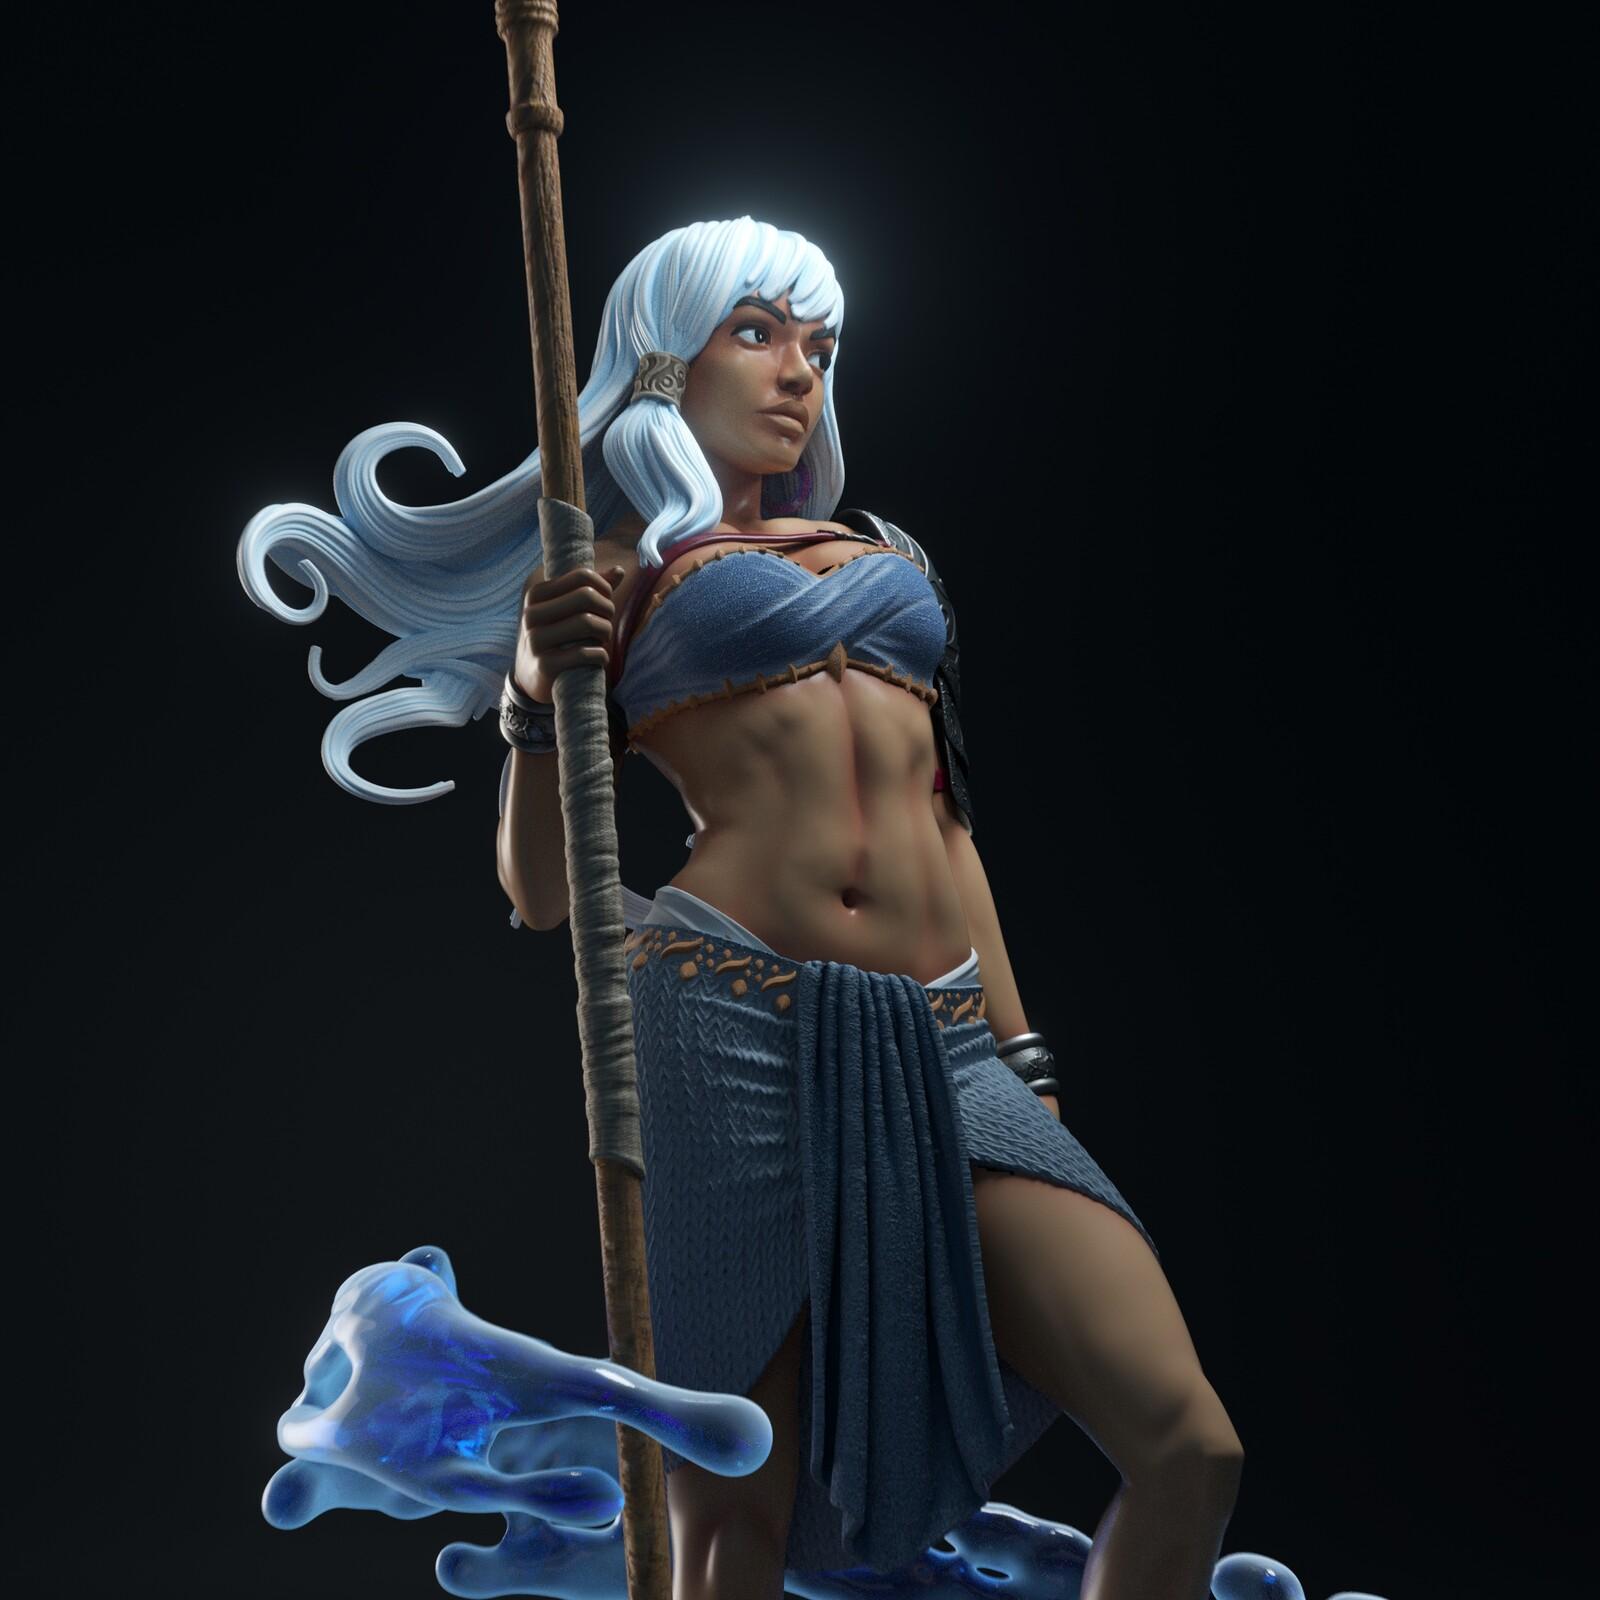 Daughter of Poseidon